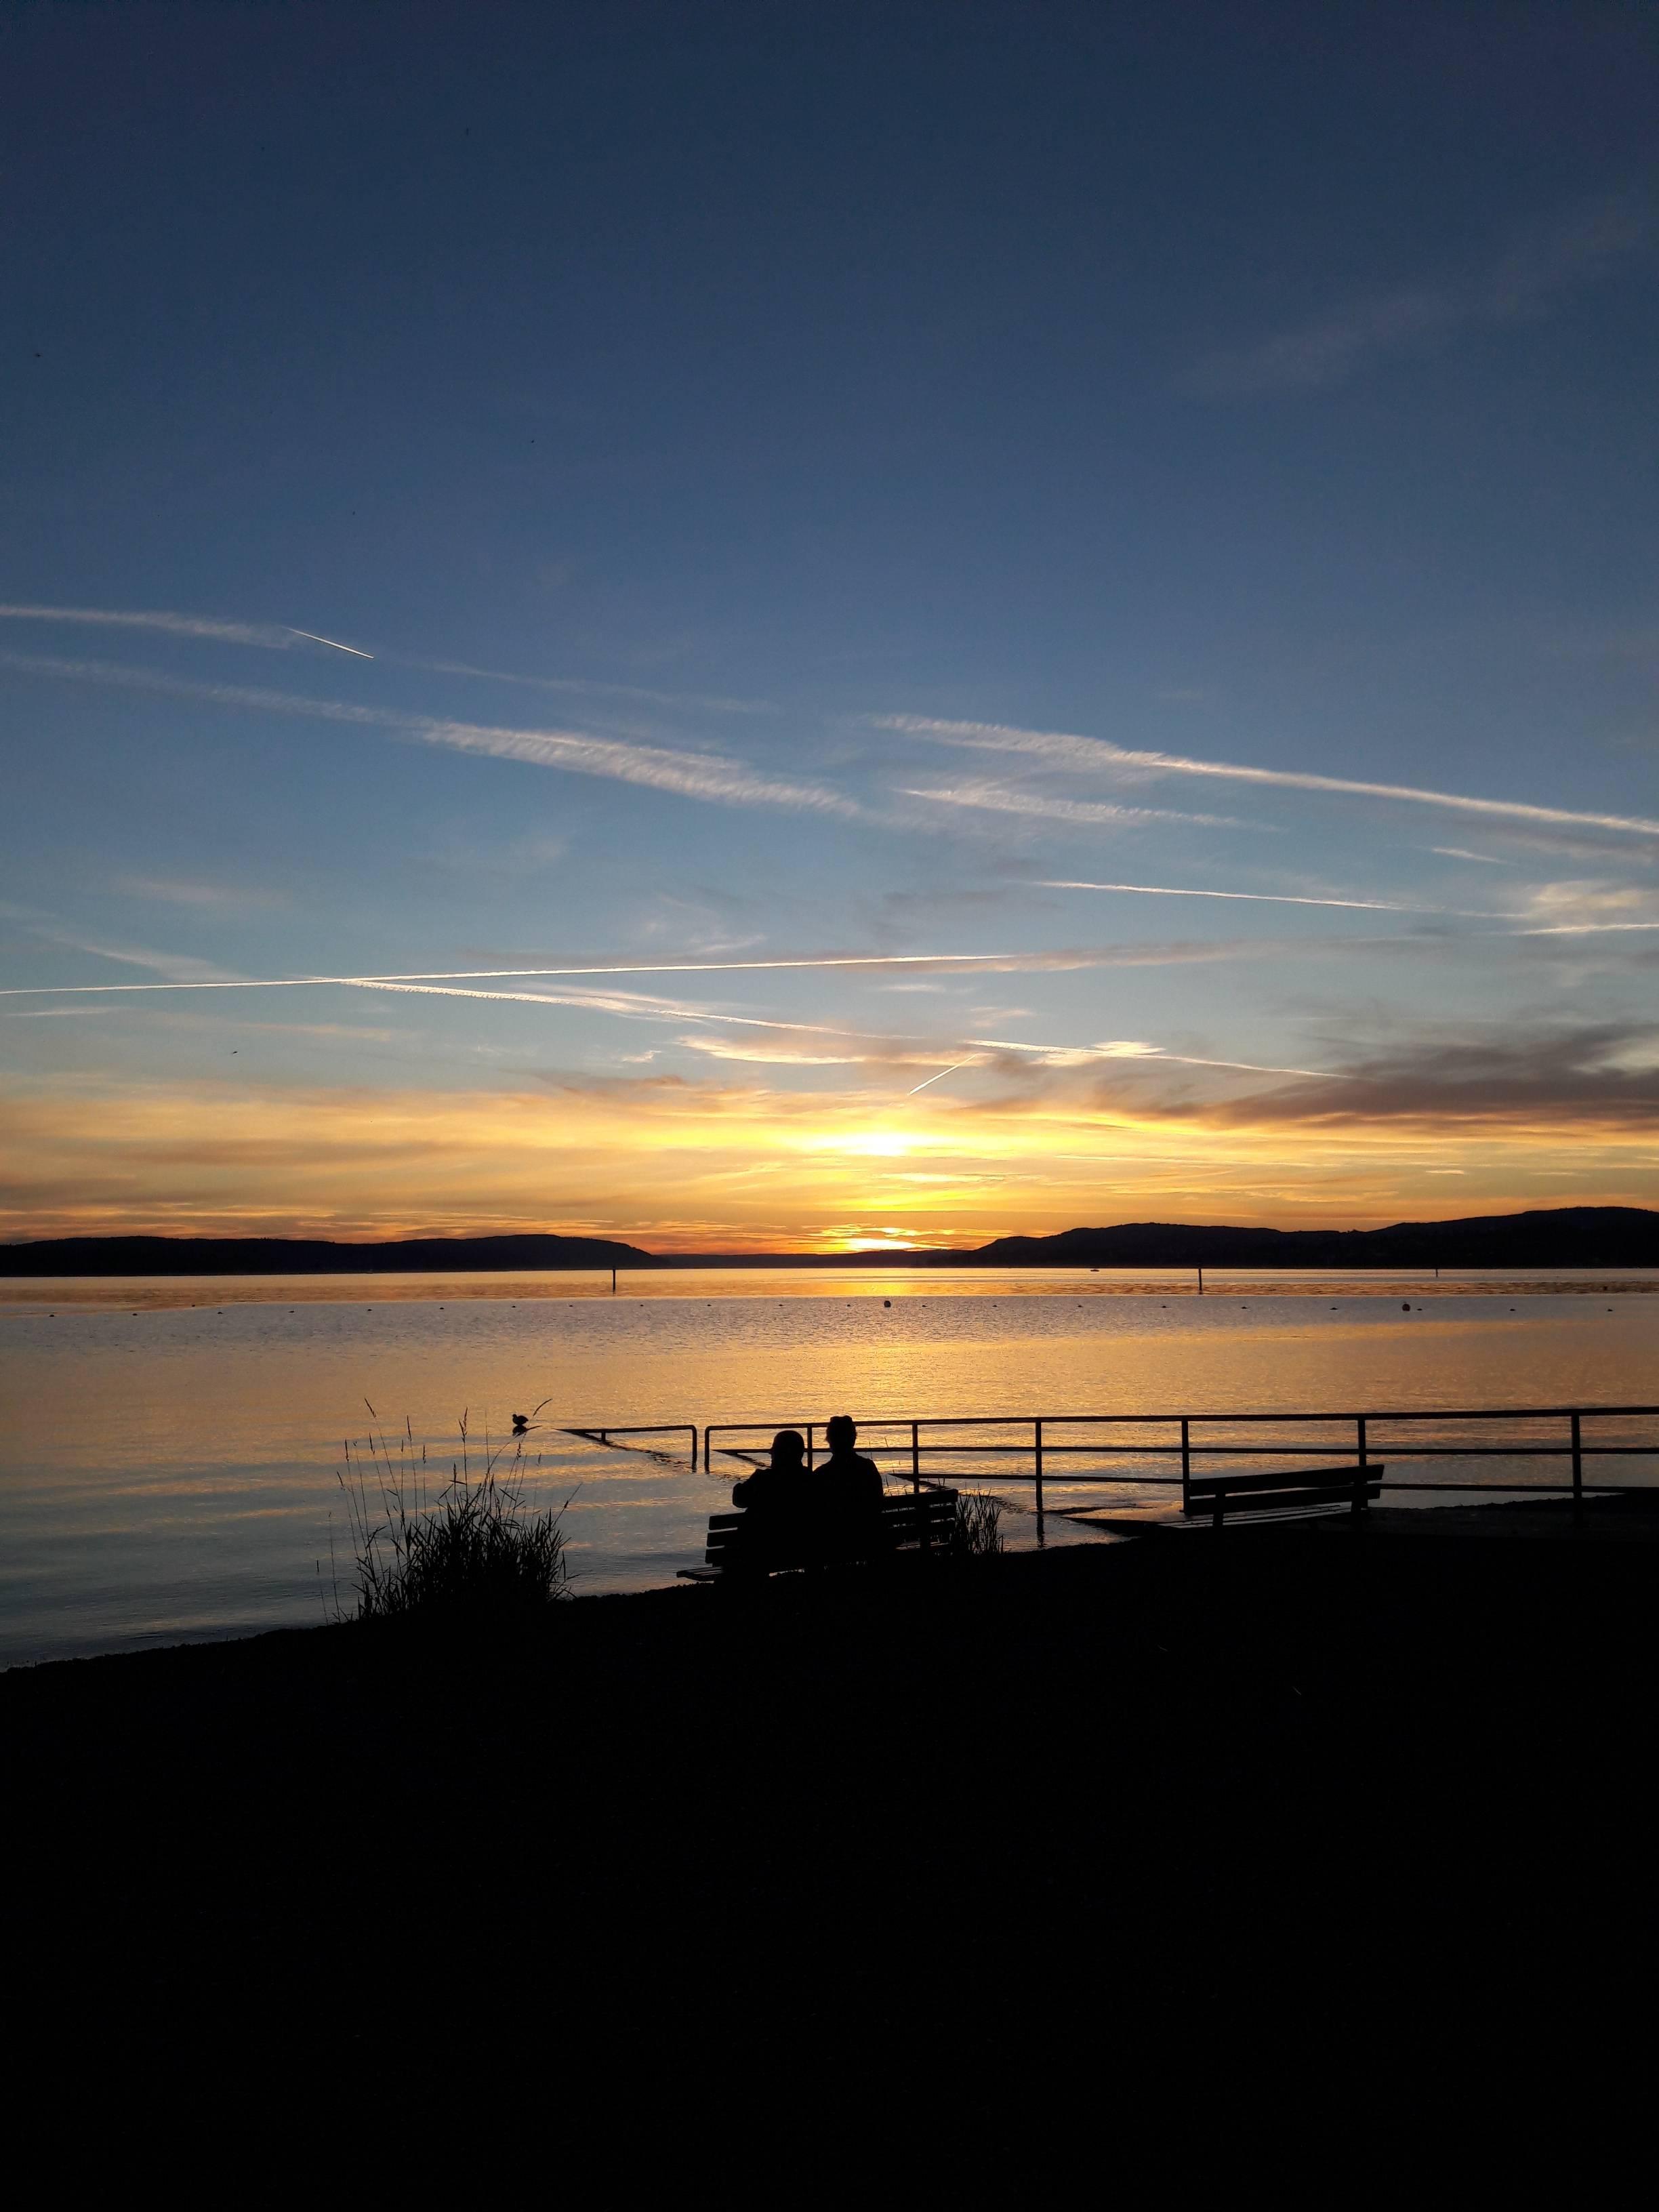 Photo 1: Rando vélo autour du Bodensee (lac de constance)